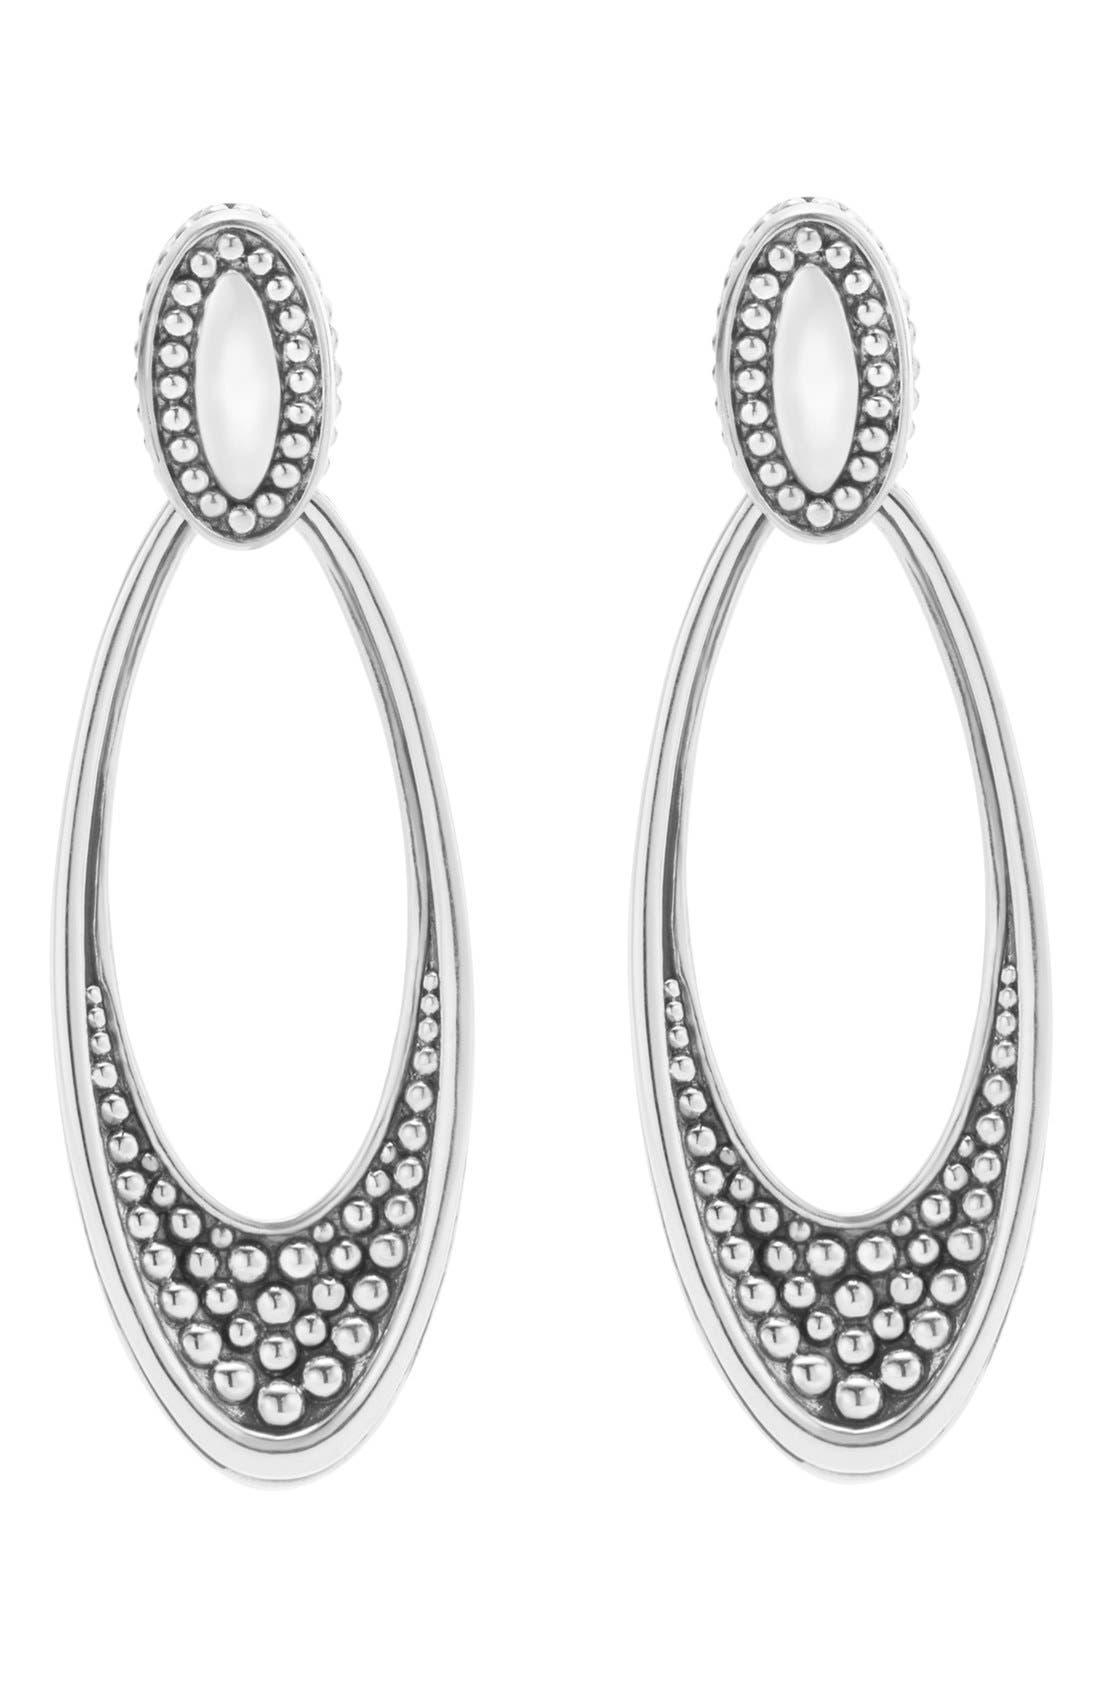 'Signature Caviar' Omega Drop Earrings,                         Main,                         color, Silver